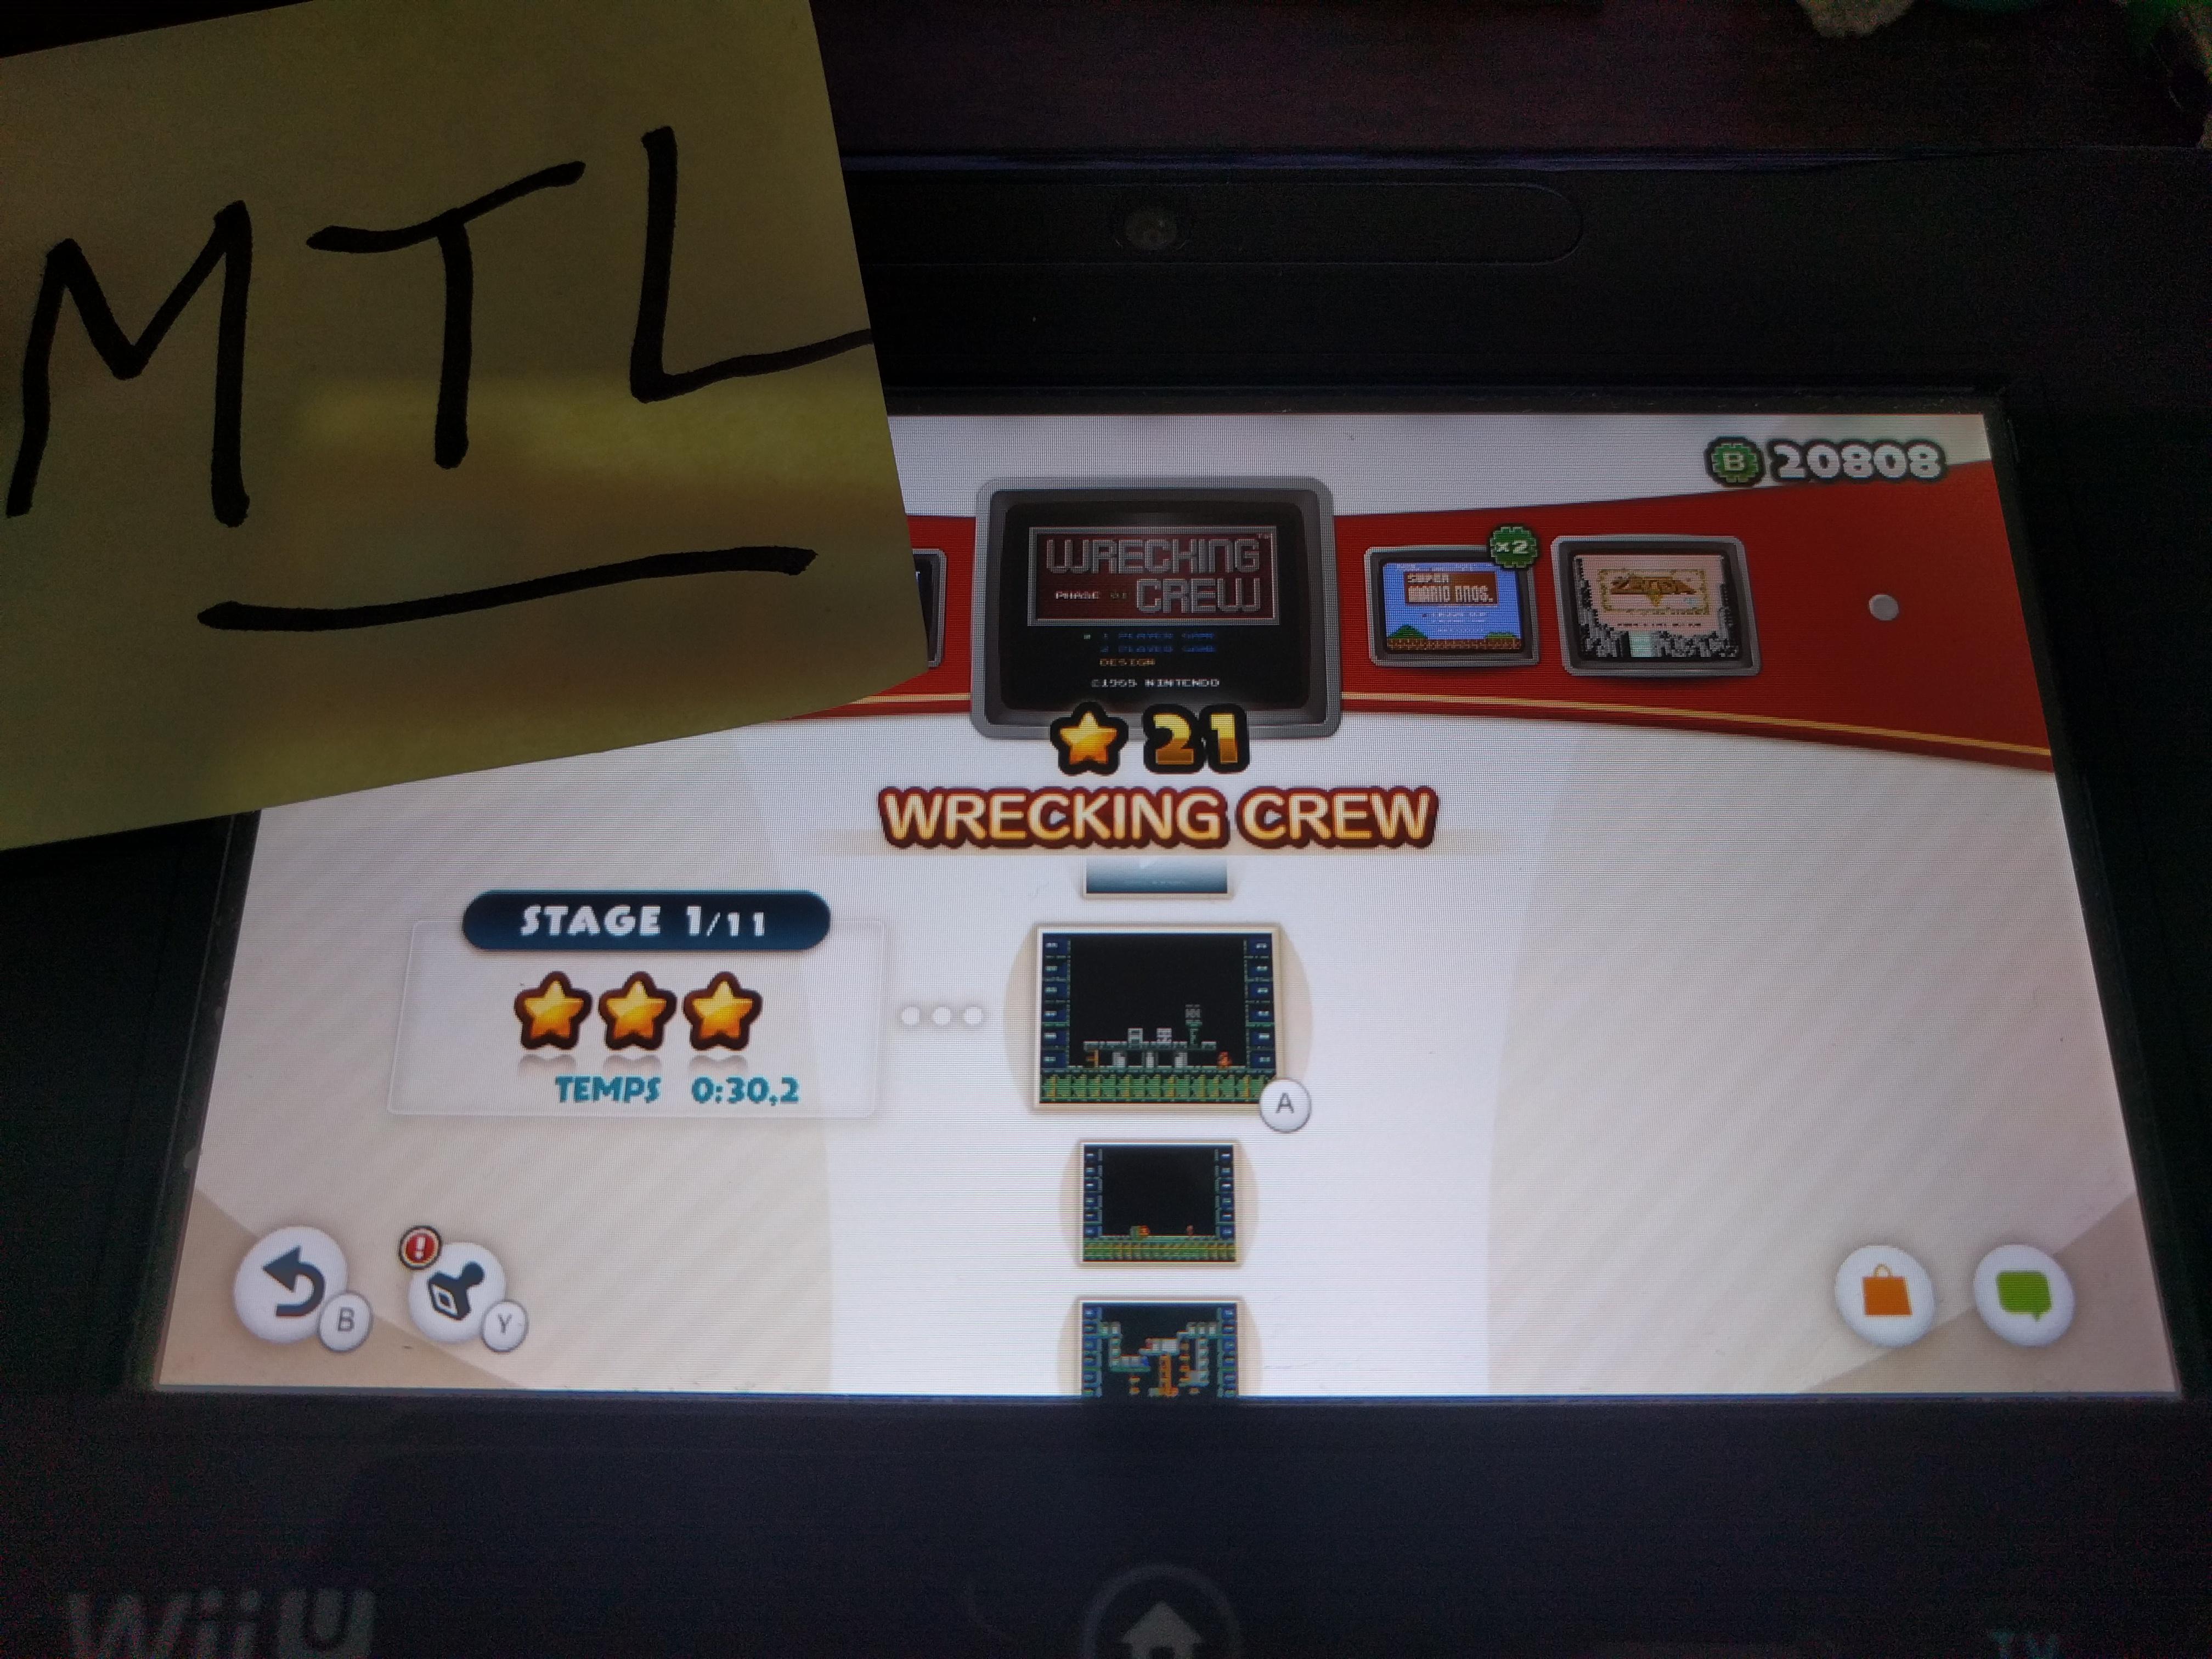 Mantalow: NES Remix: Wrecking Crew: Stage 1 (Wii U) 0:00:30.2 points on 2016-06-11 03:07:12